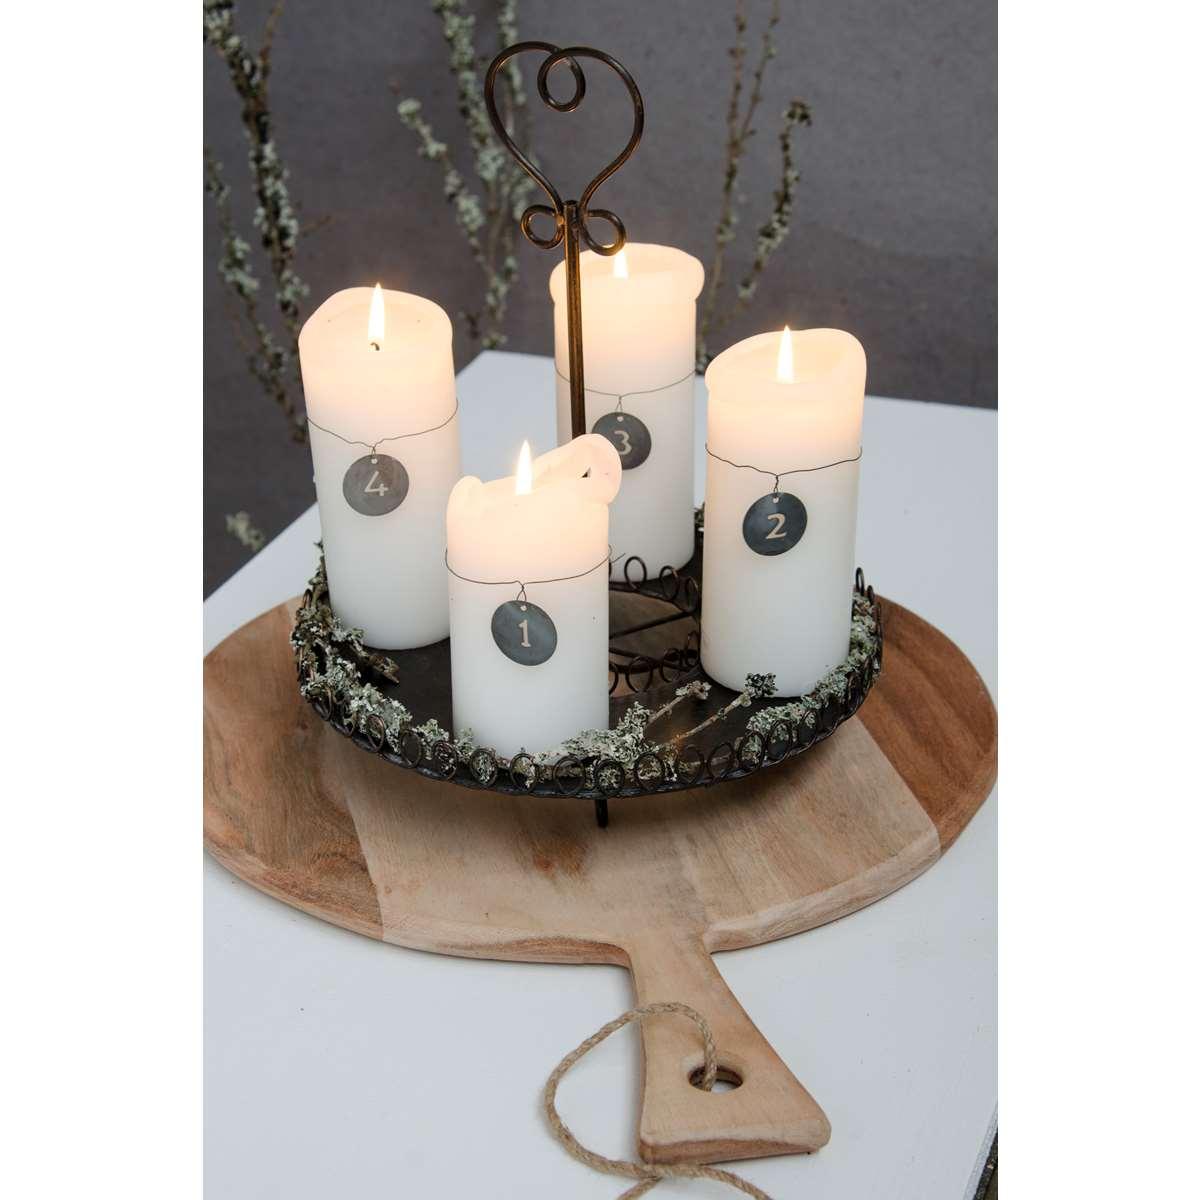 laursen kerzenst nder metall schwarz 3338 25. Black Bedroom Furniture Sets. Home Design Ideas